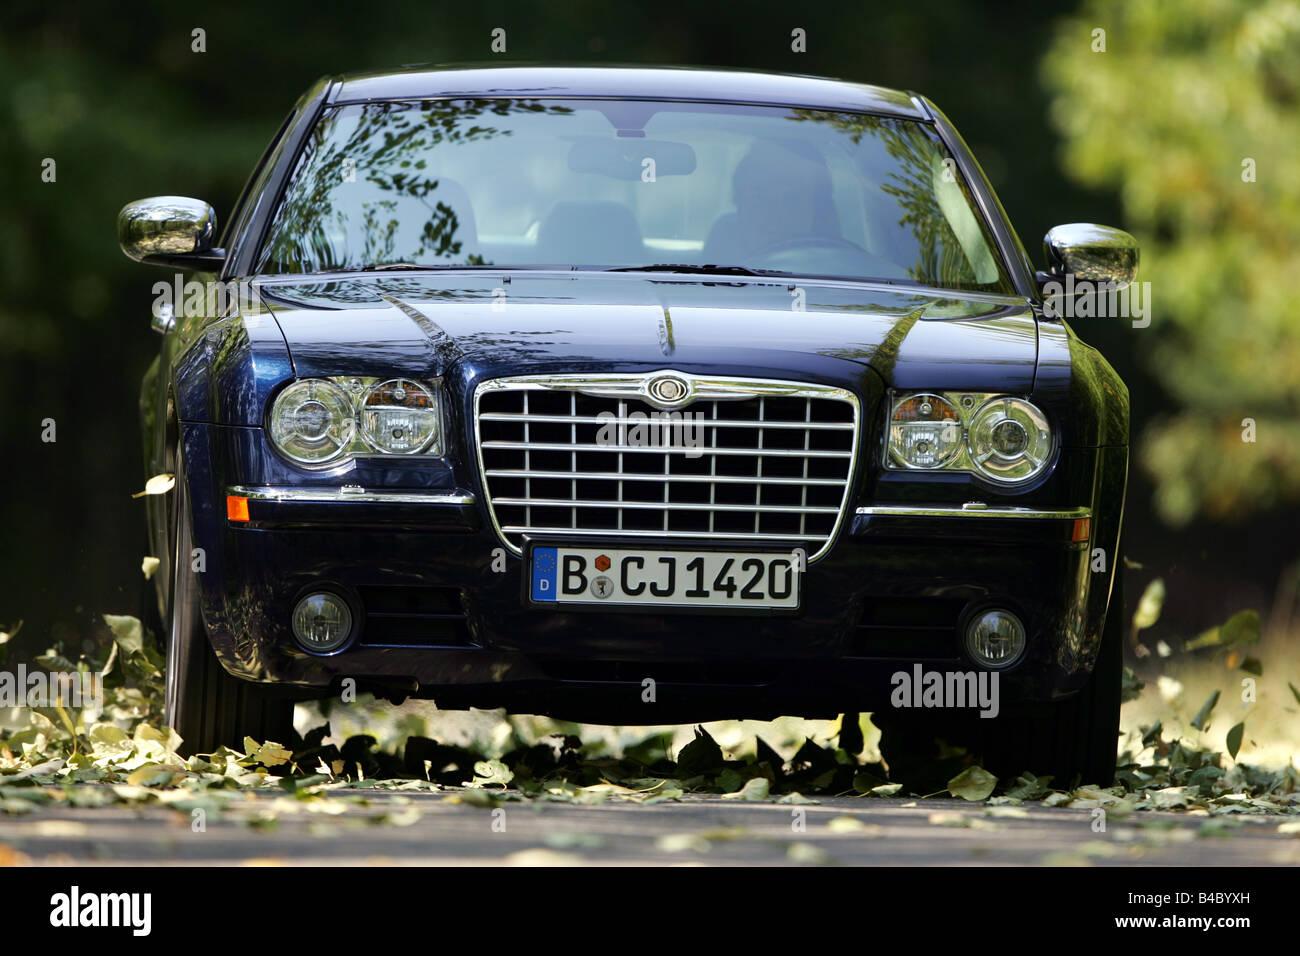 100 ideas 2004 chrysler 300c on stylecars car chrysler 300c 57 hemi model year 2004 limousine dark vanachro Image collections